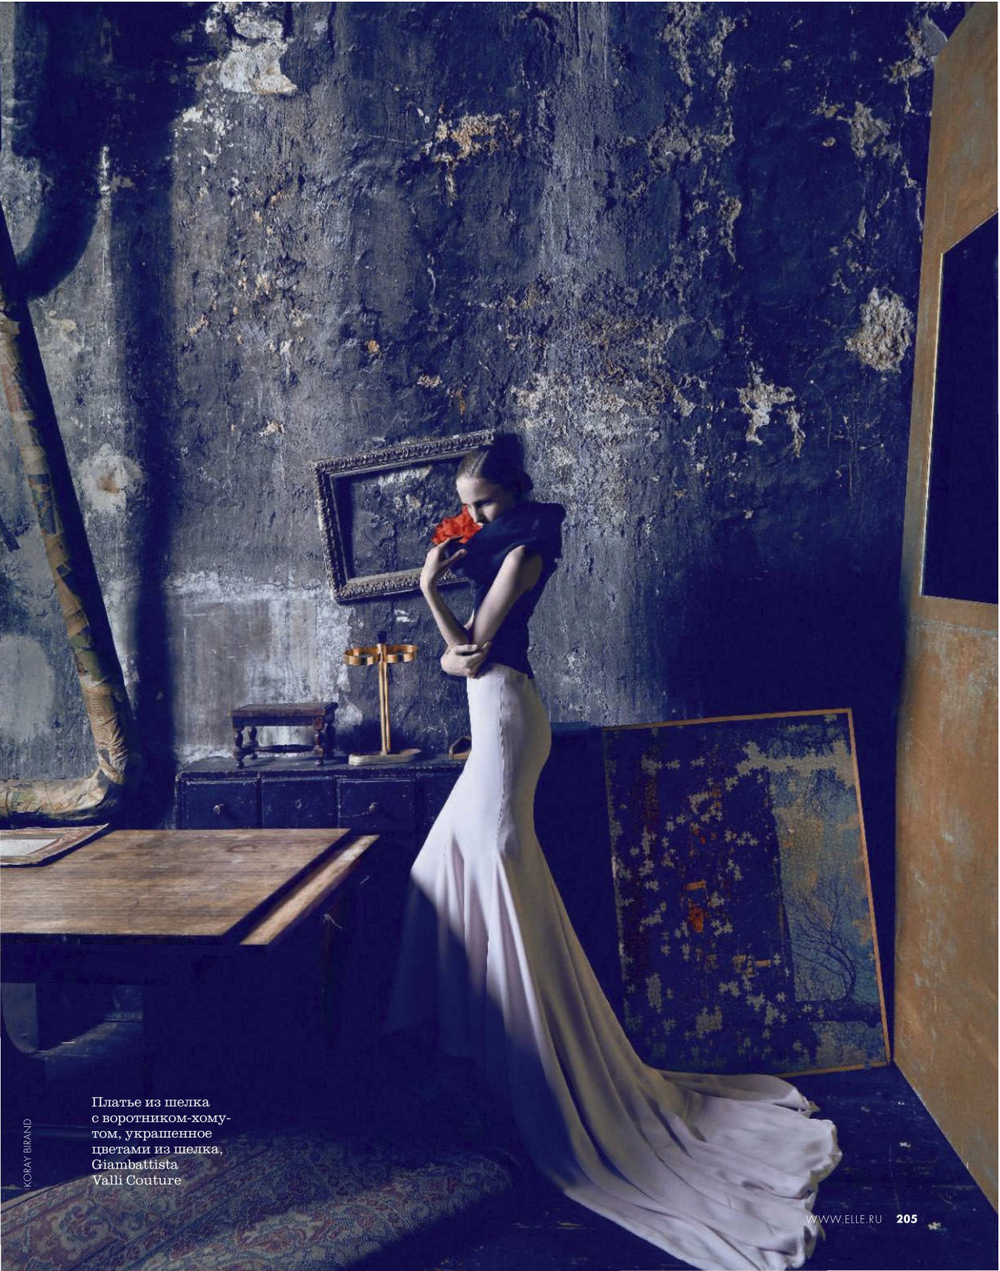 Simply Breathtaking: Giambattista Valli Couture. Photo via ELLE Russia